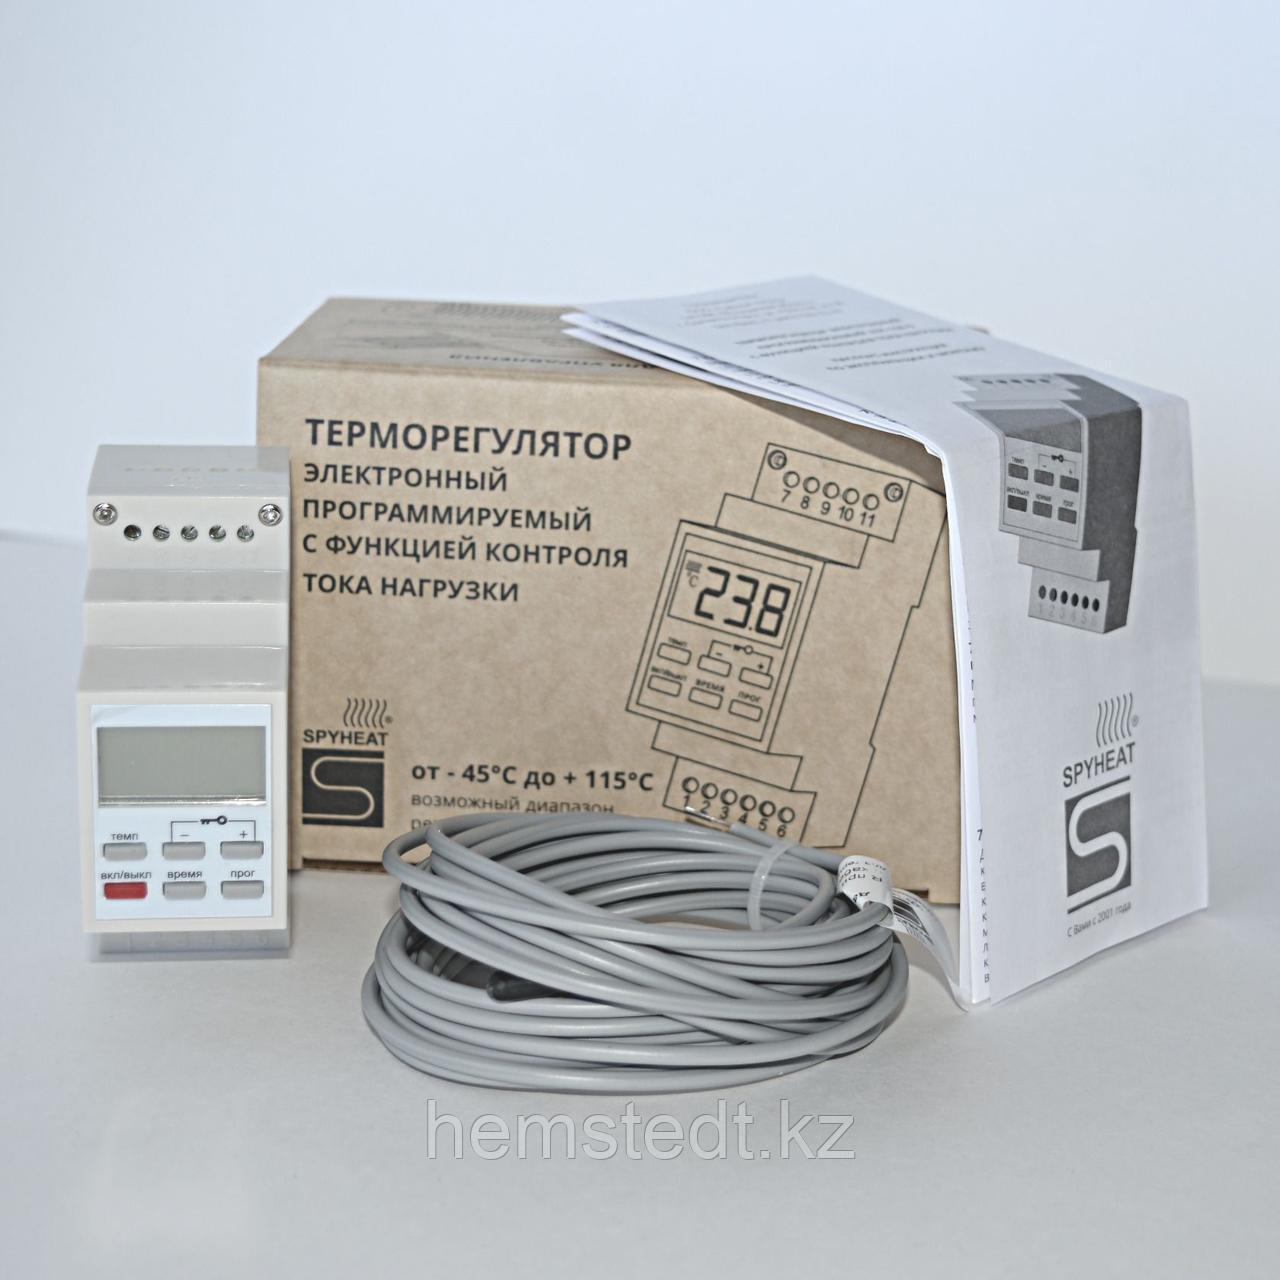 Терморегулятор AST-158-D на дин-рейку программируемый